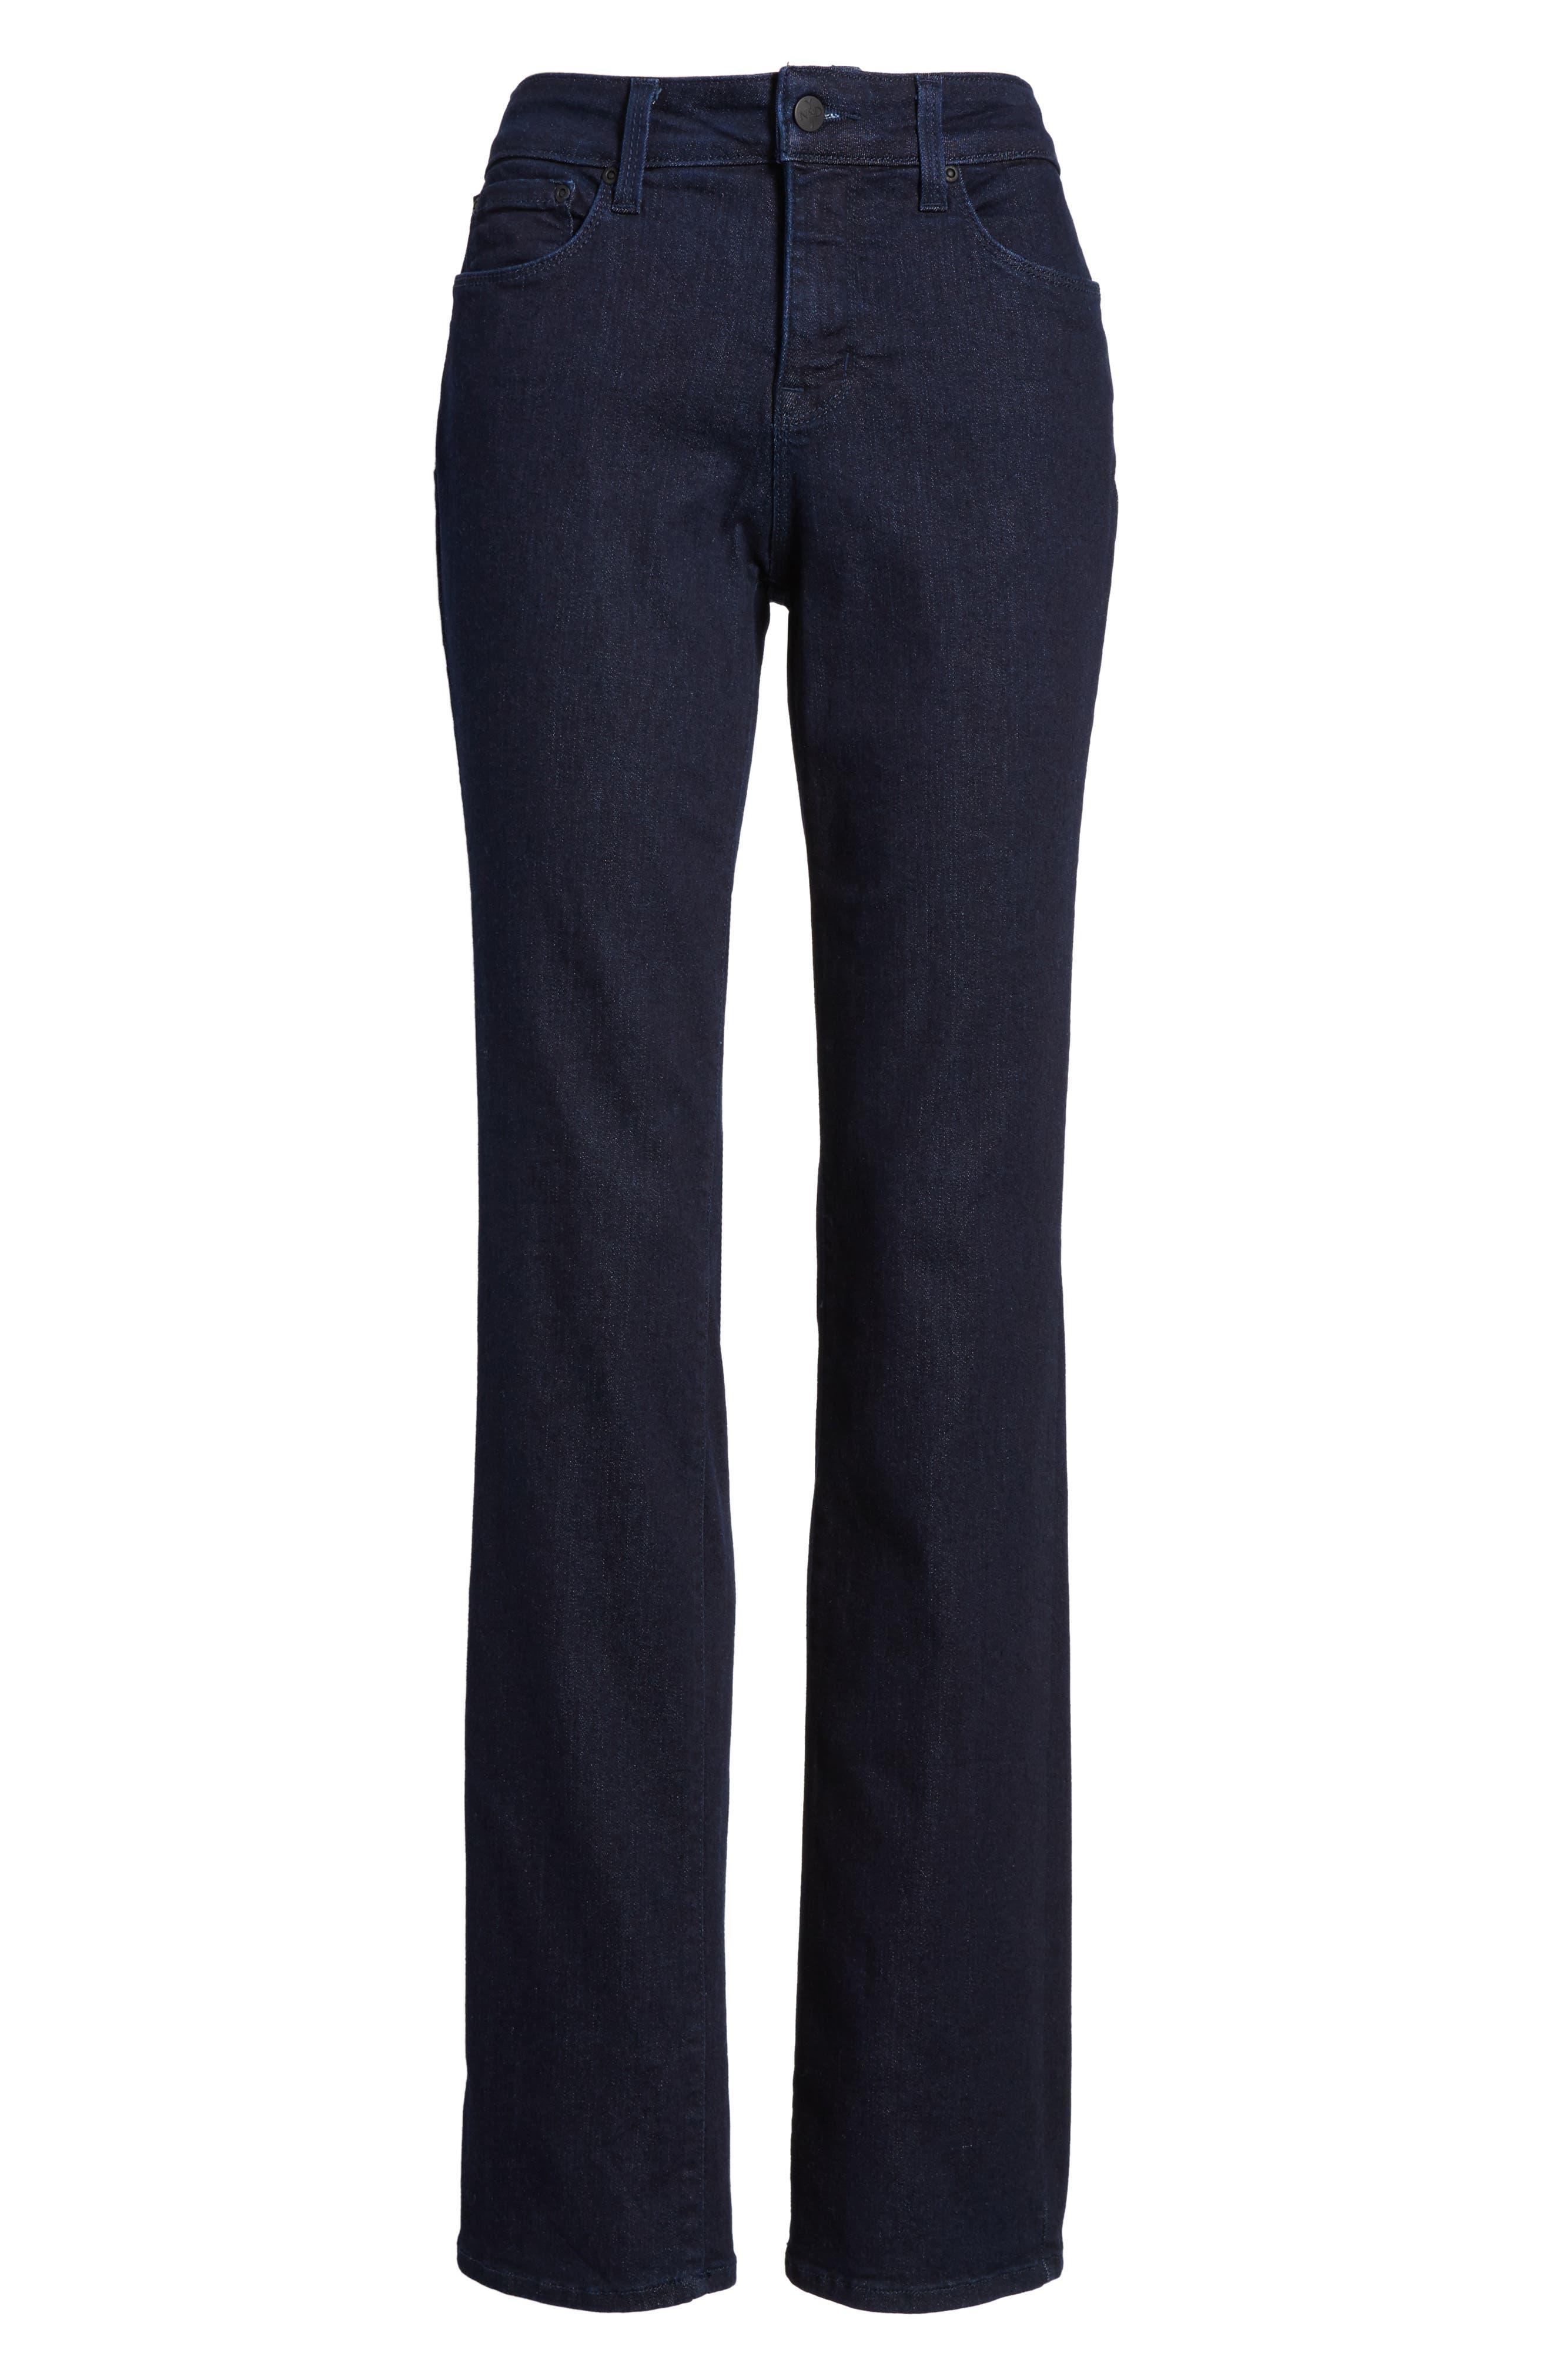 Alternate Image 5  - NYDJ Marilyn Stretch Straight Leg Jeans (Rinse) (Regular & Petite)